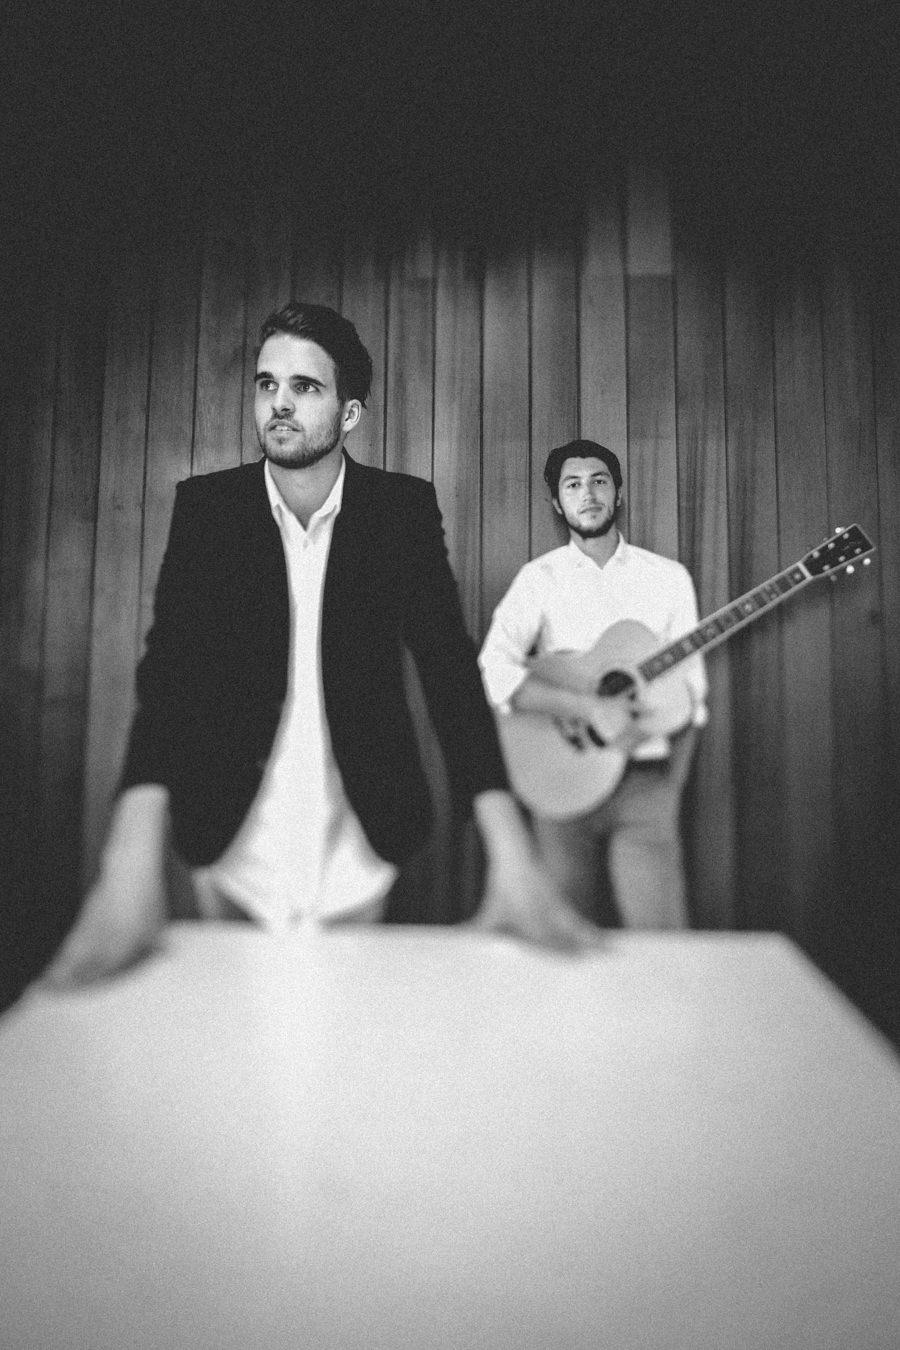 TilleeMusic-Tim&James009